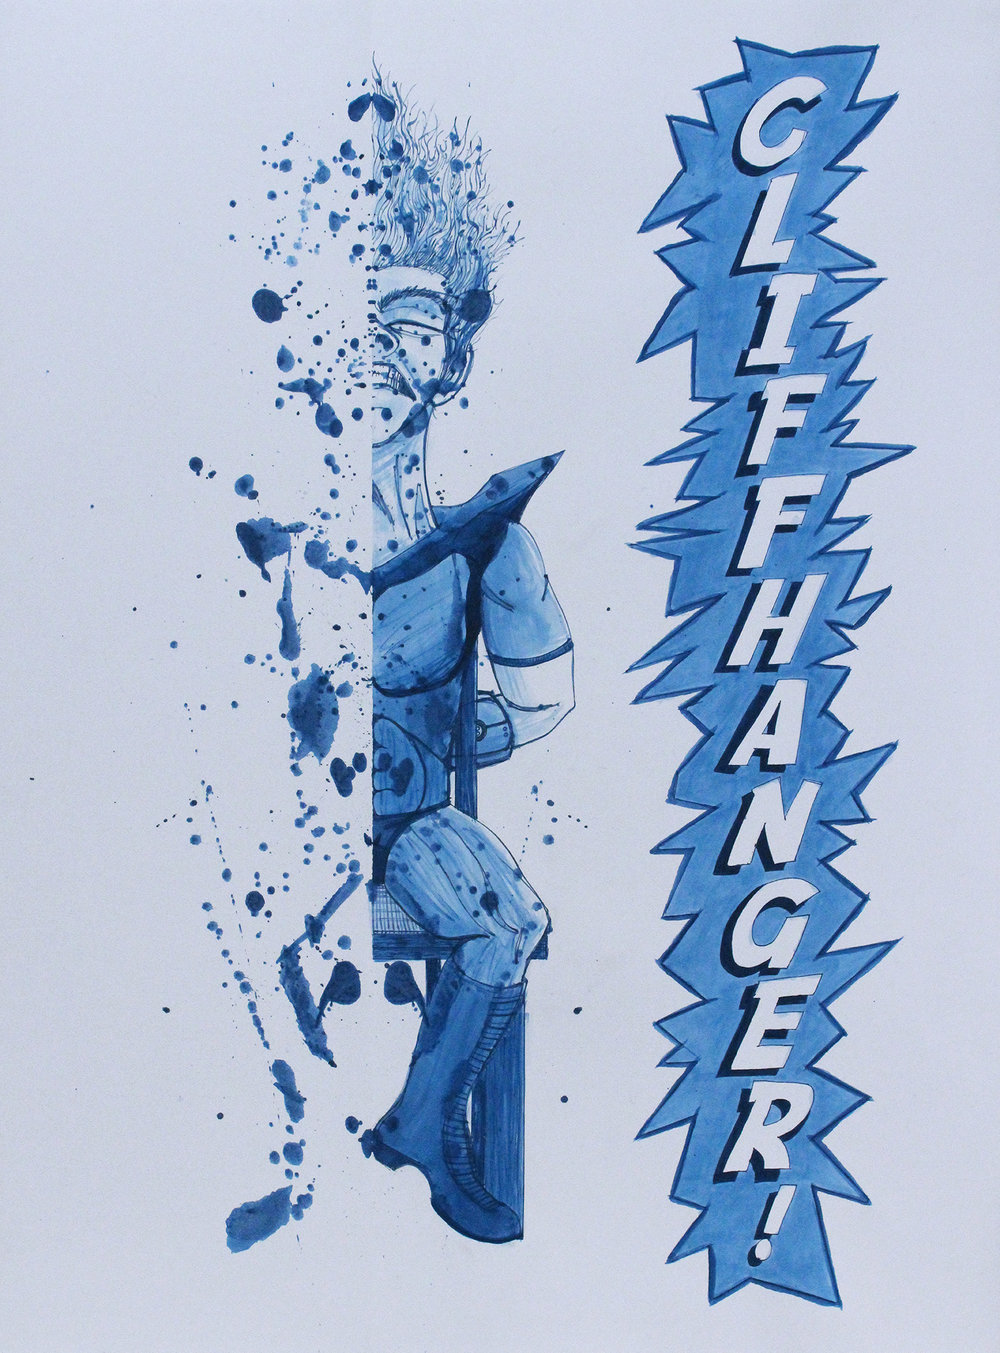 CLIFFHANGER!